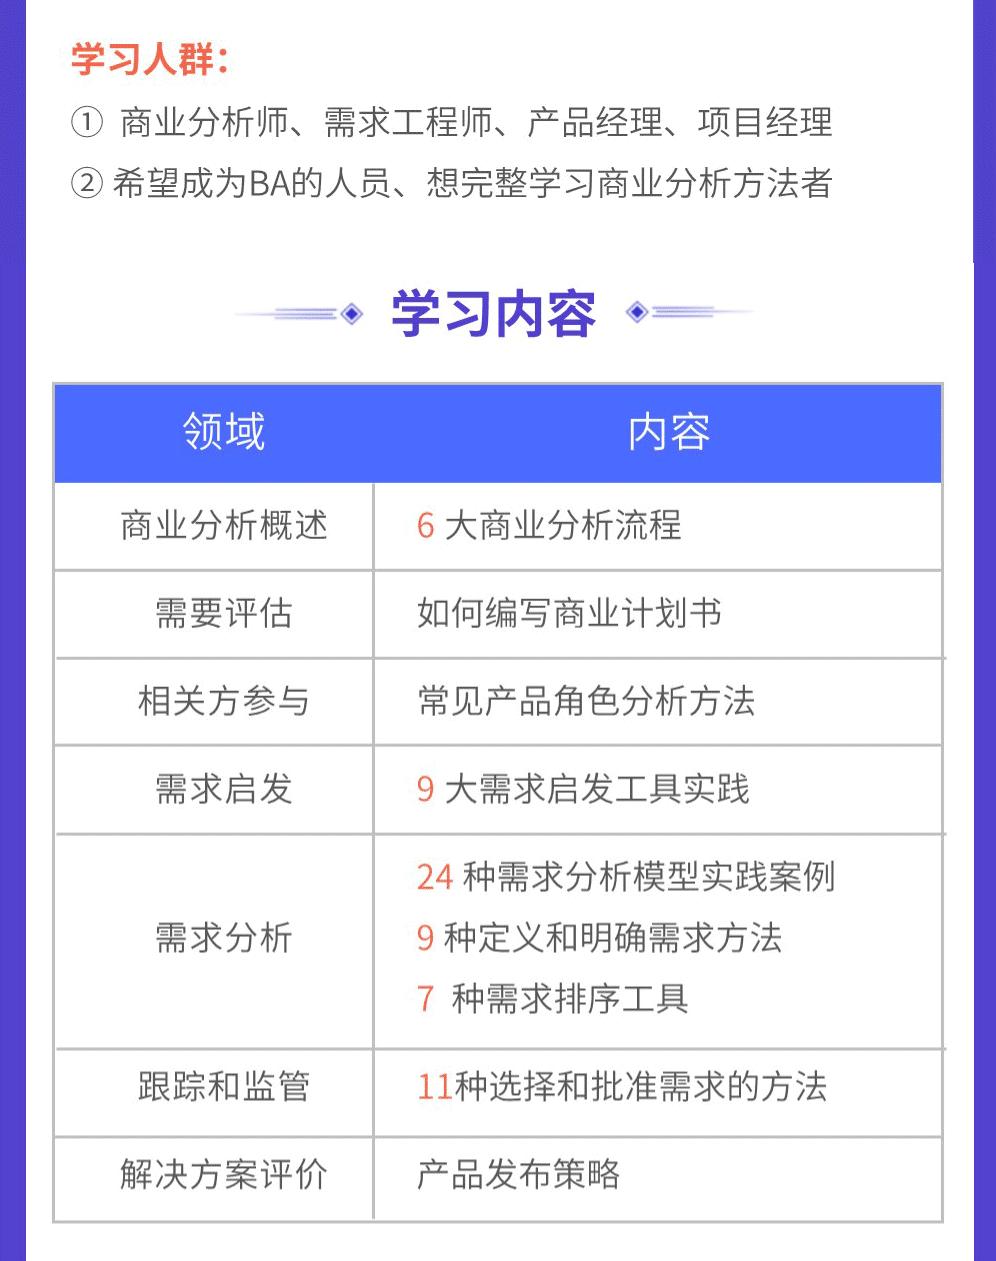 PBA简章V2-3.png